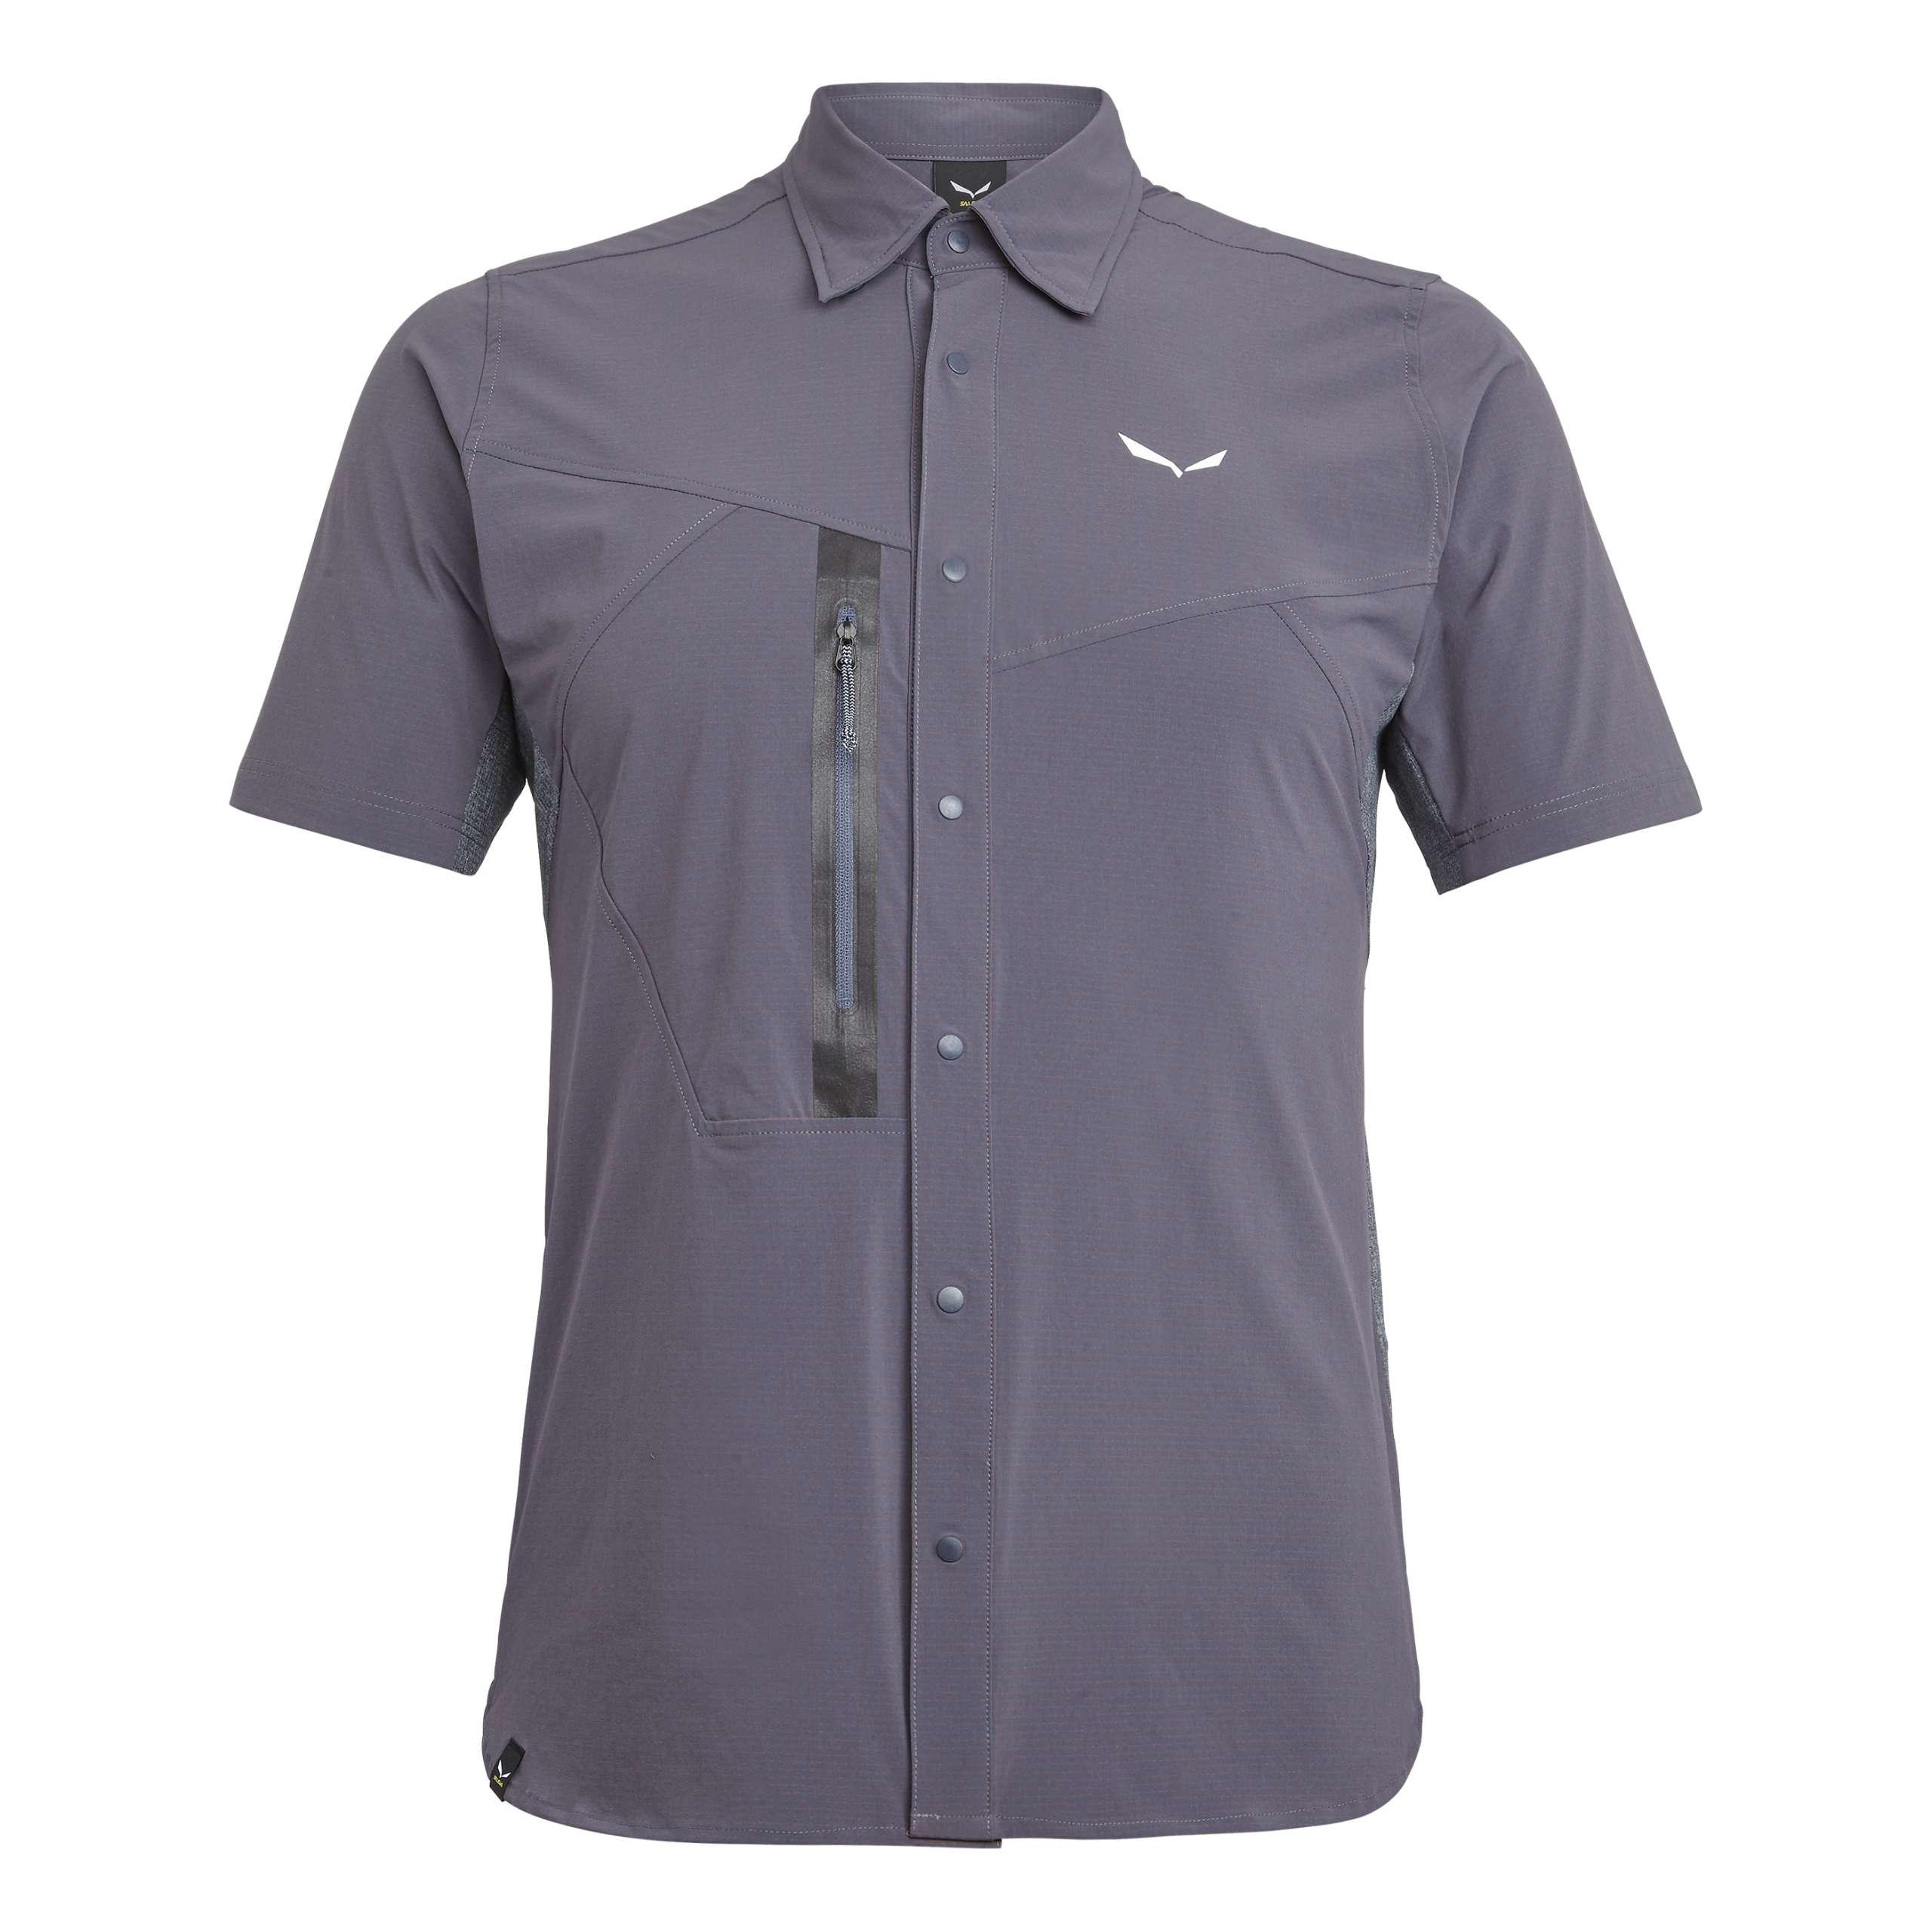 huge selection of 21aa7 4ae74 Puez Hybrid Dry Short-Sleeve Men's Shirt